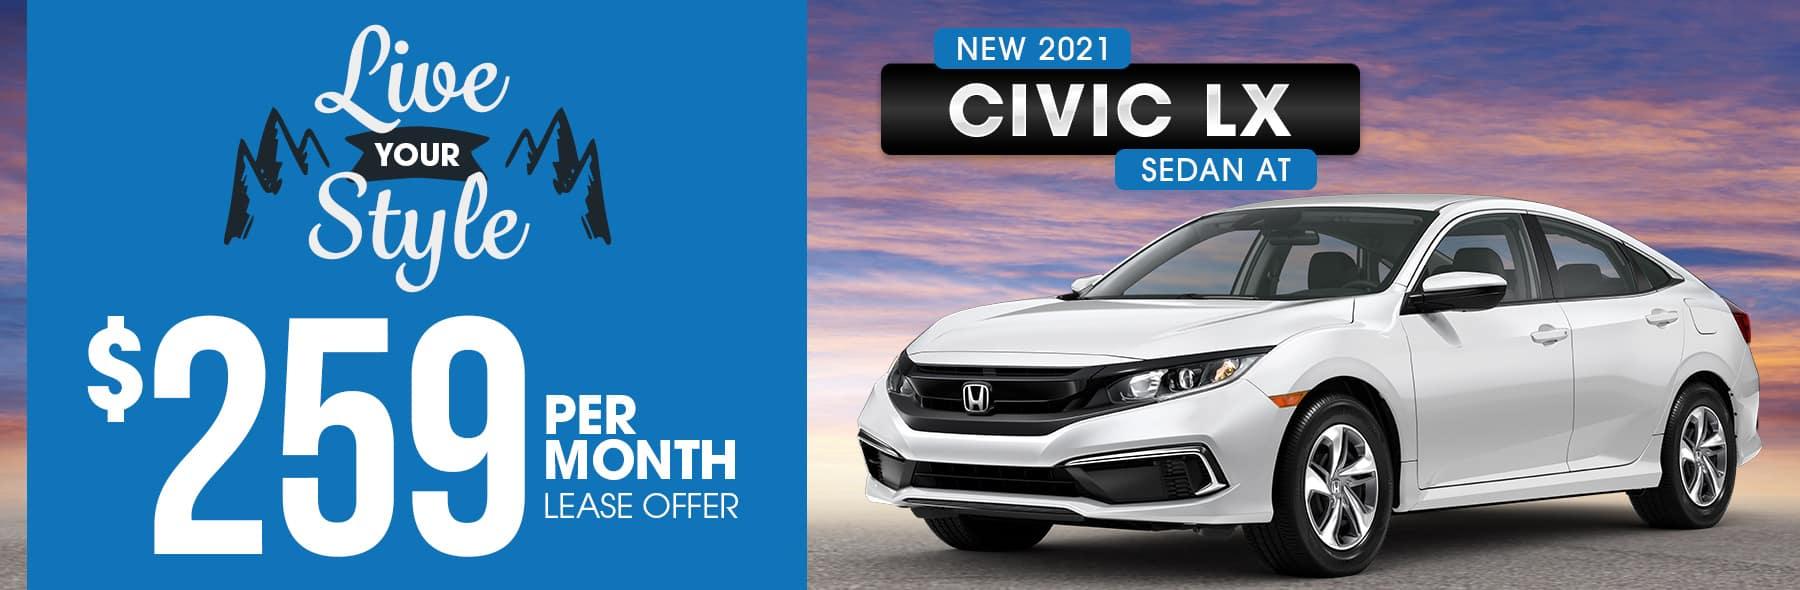 IGH-June21-HP-Civic-LX-v1